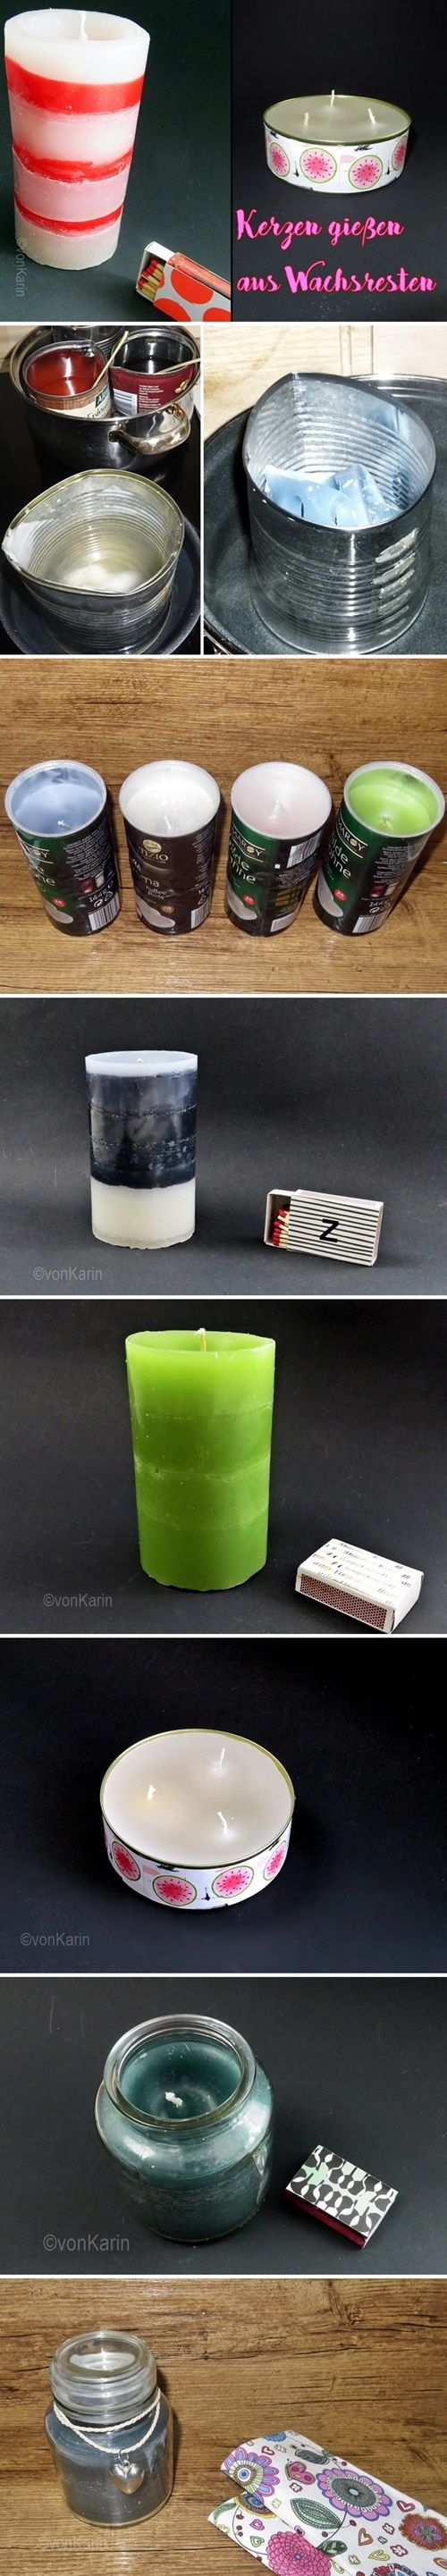 25 unique old candles ideas on pinterest diy candles using old candles diy candles from old. Black Bedroom Furniture Sets. Home Design Ideas